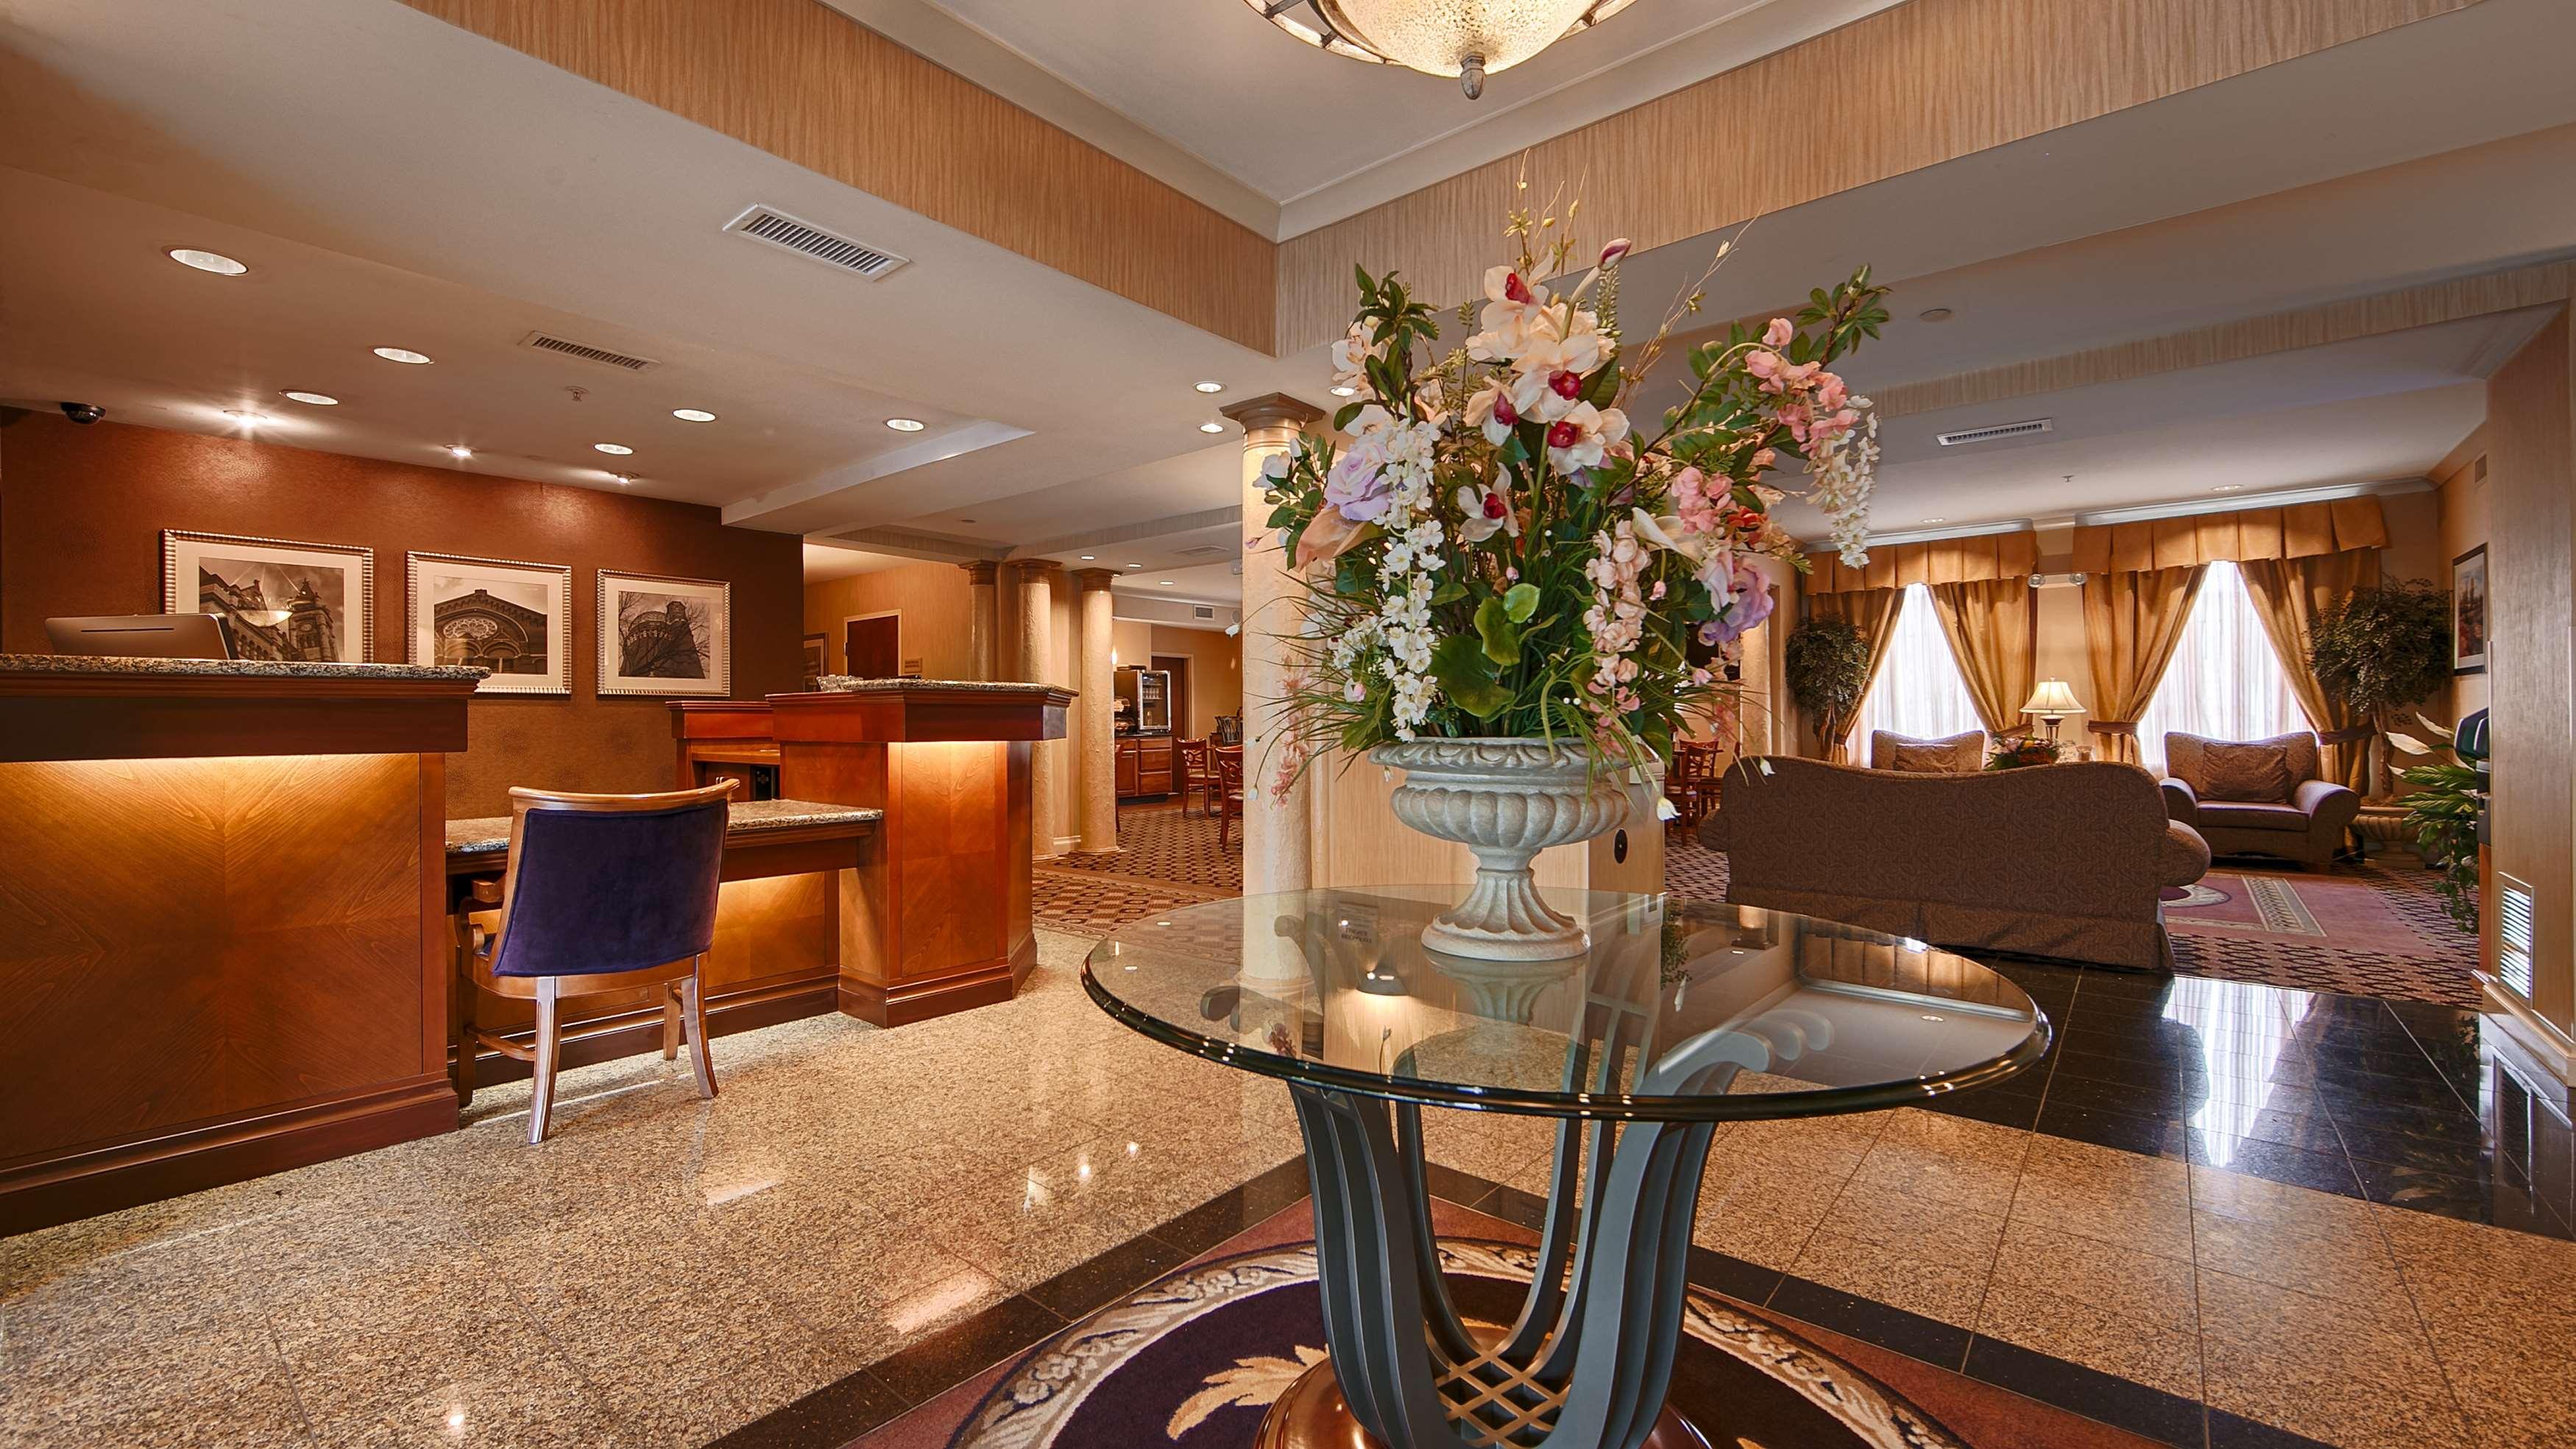 Best Western Plus Hannaford Inn & Suites image 3